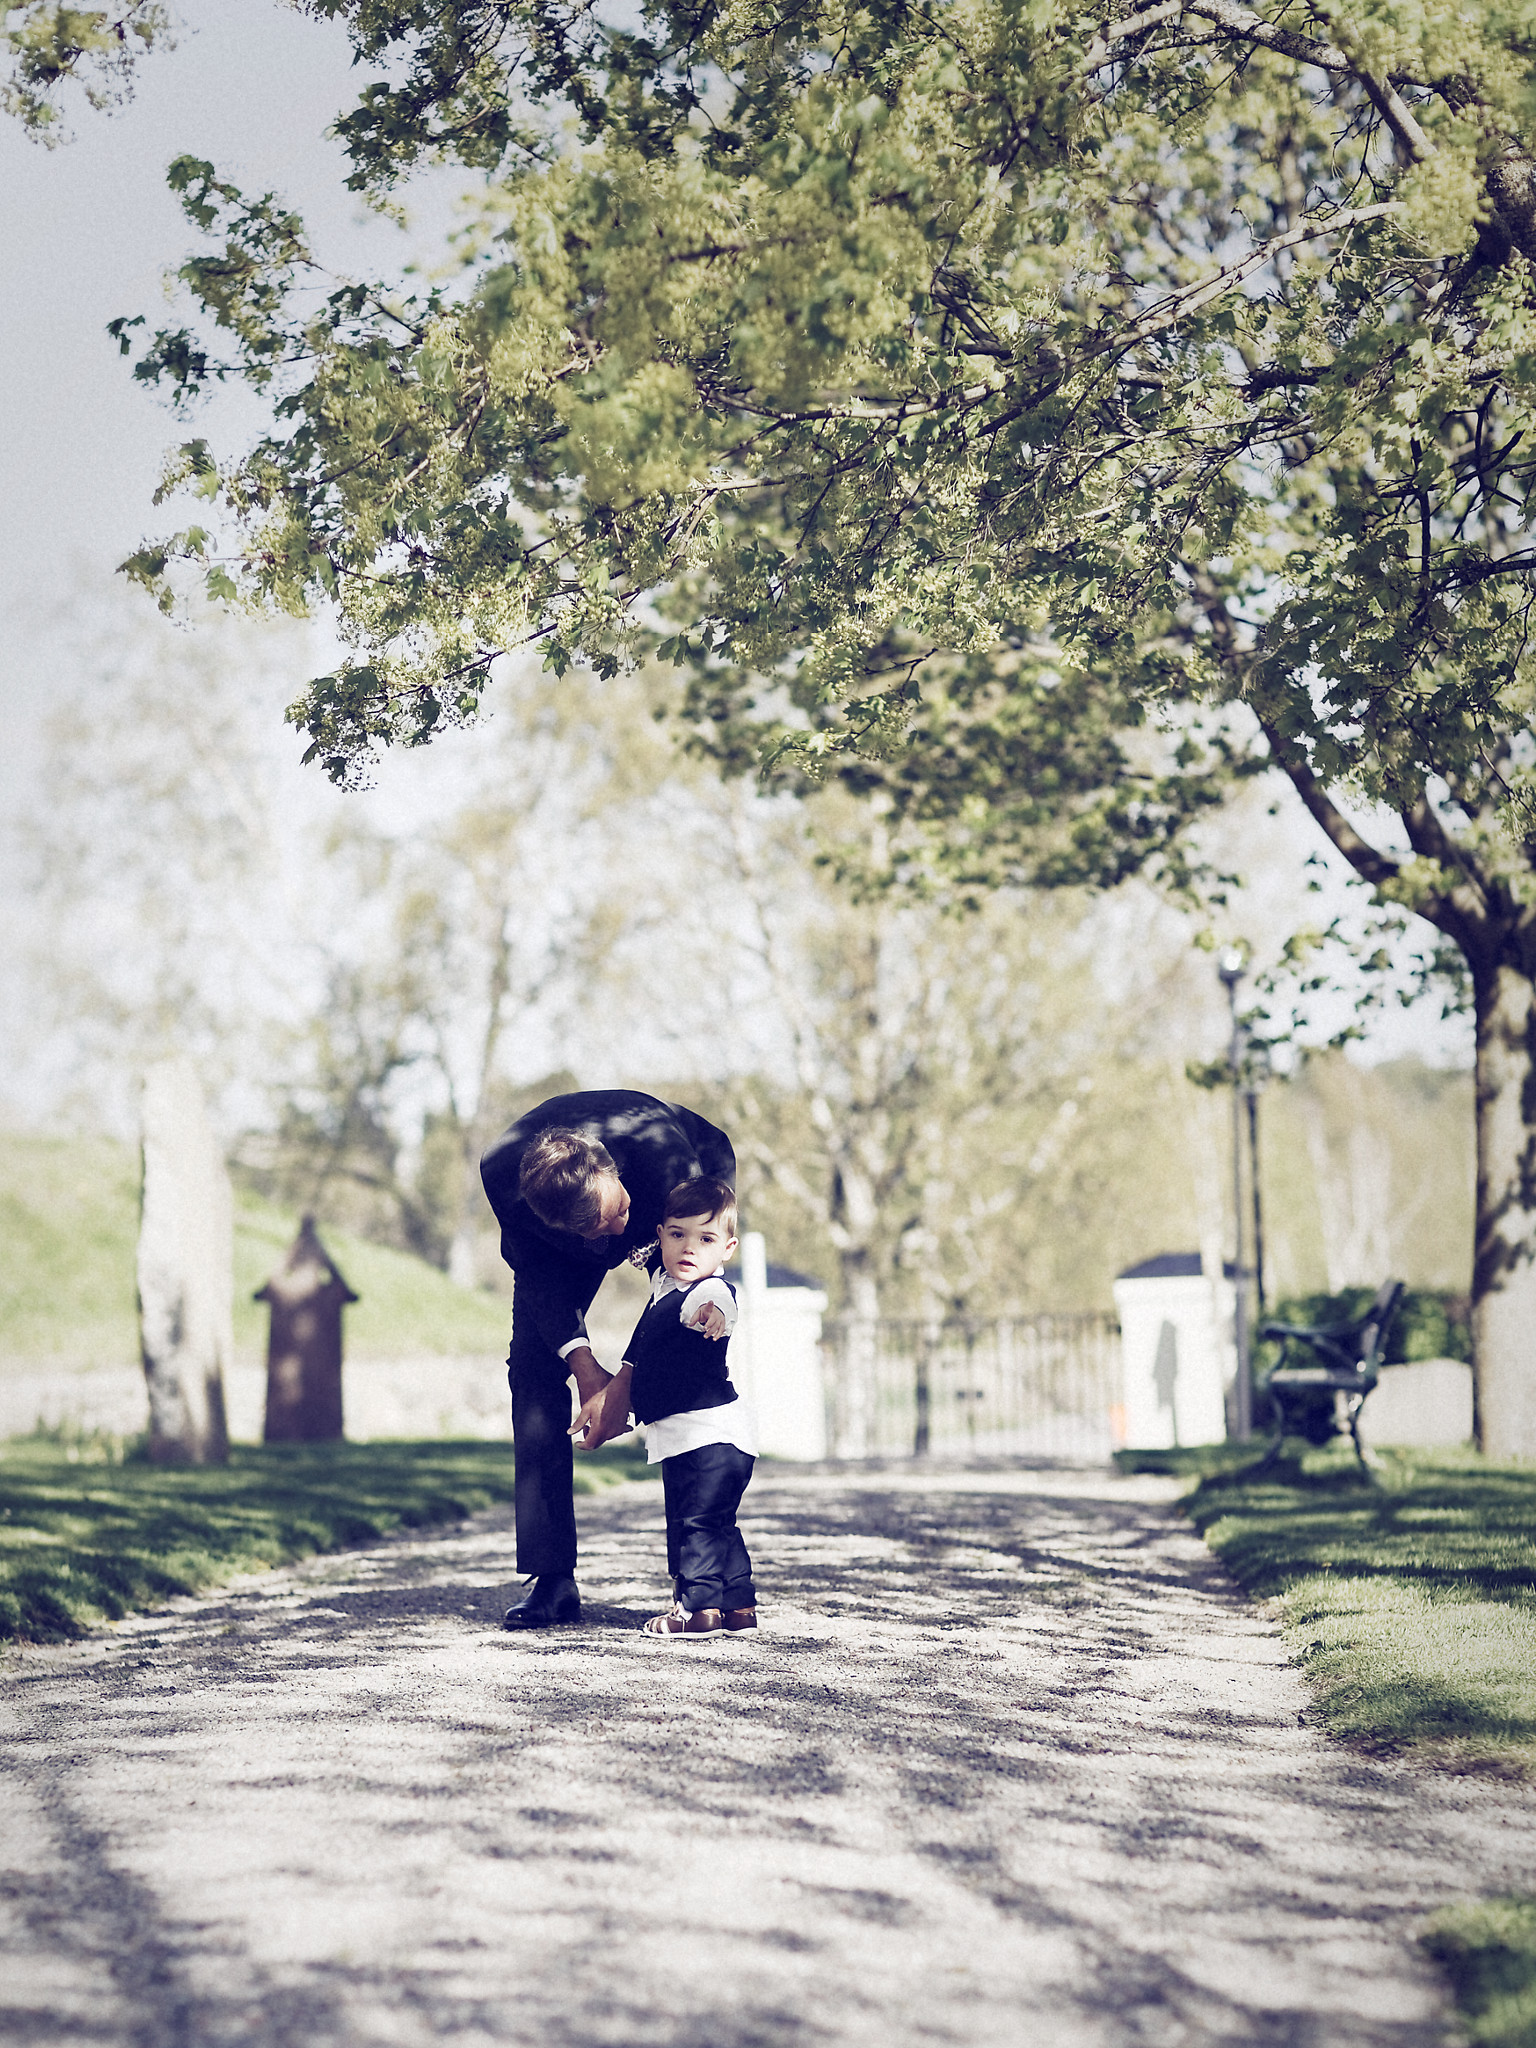 Bröllop - släkten 1